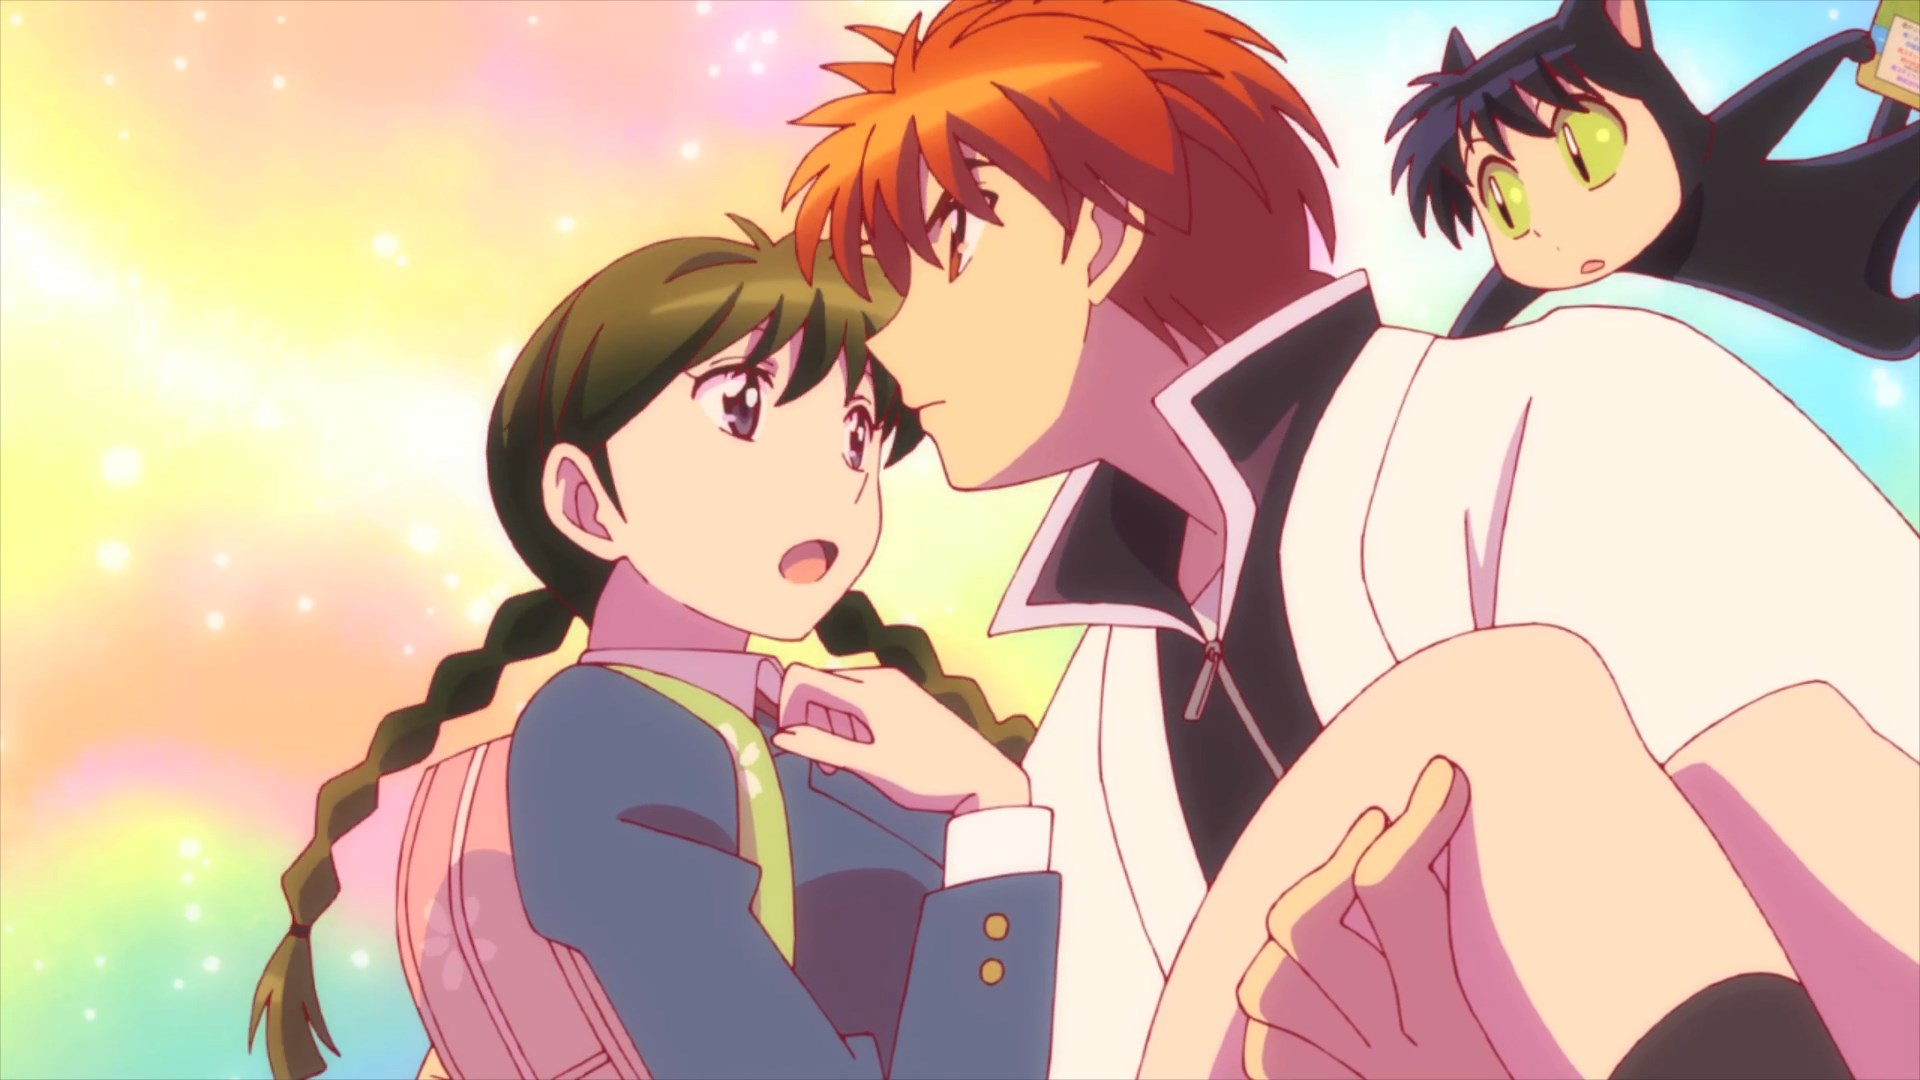 Kiss Day Wallpaper Hd Kyoukai No Rinne 49 Penultimate Episode Astronerdboy S